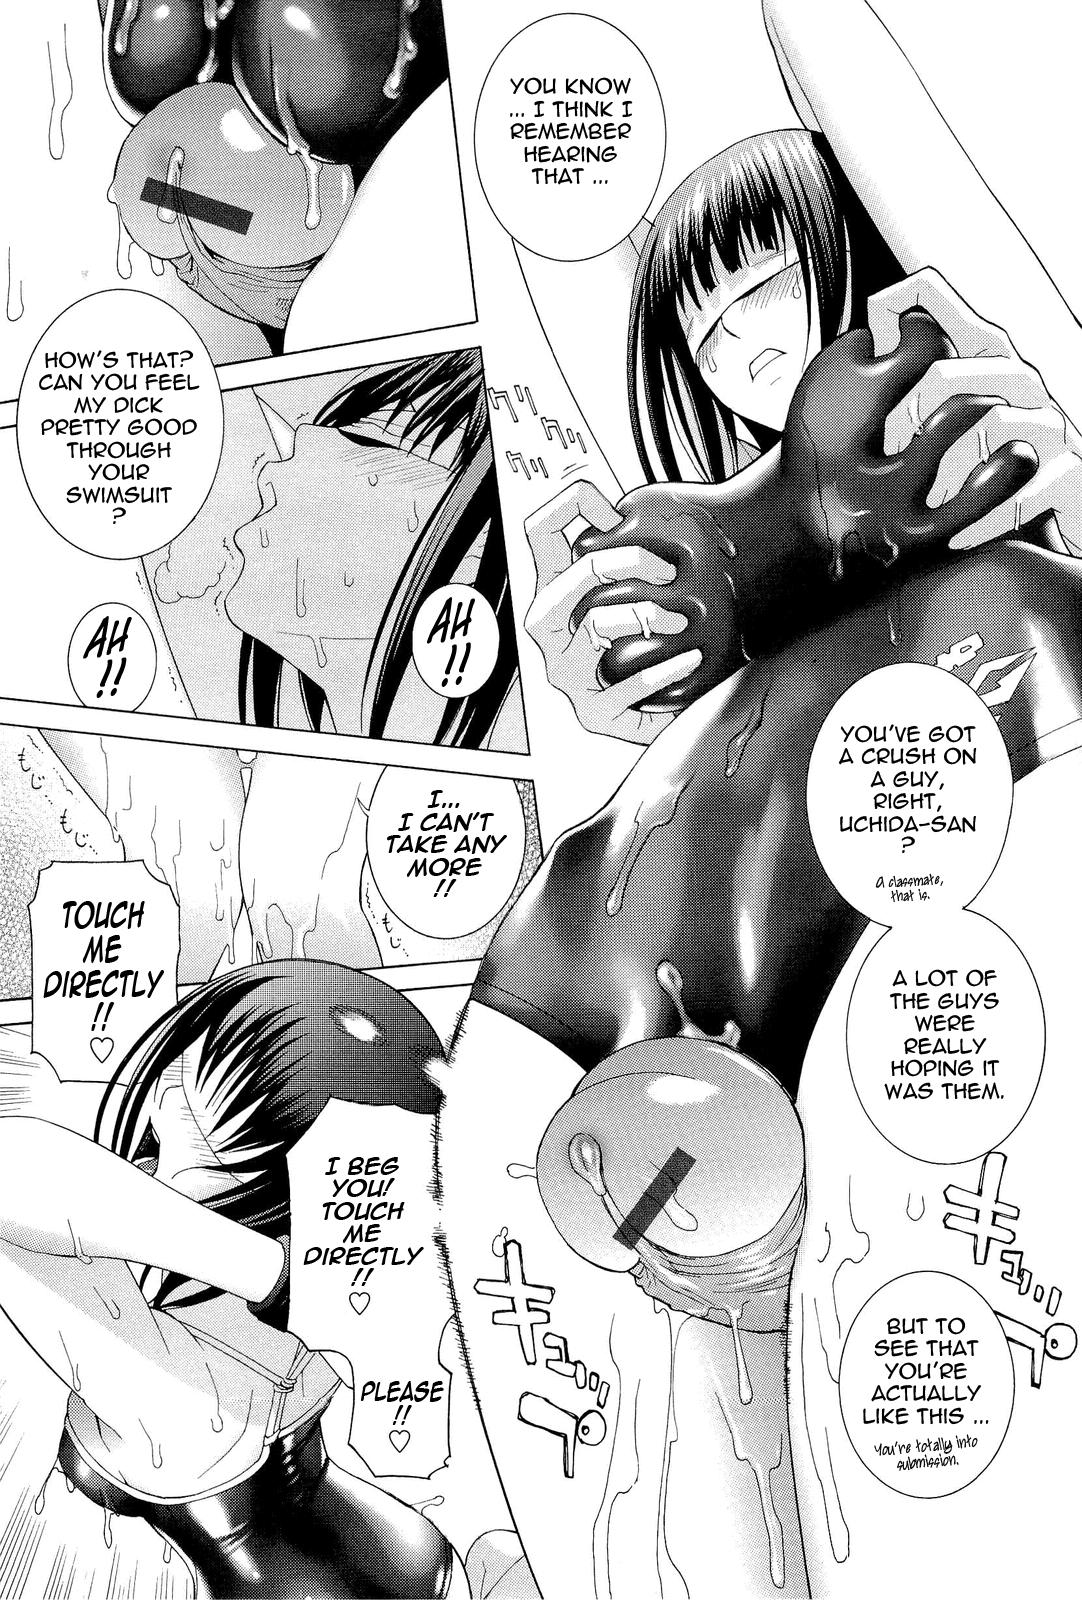 [Shinobu Tanei] Ane ♡ Imouto Love | Big-Sis Lil-Sis Love [English] {Tadanohito} 191